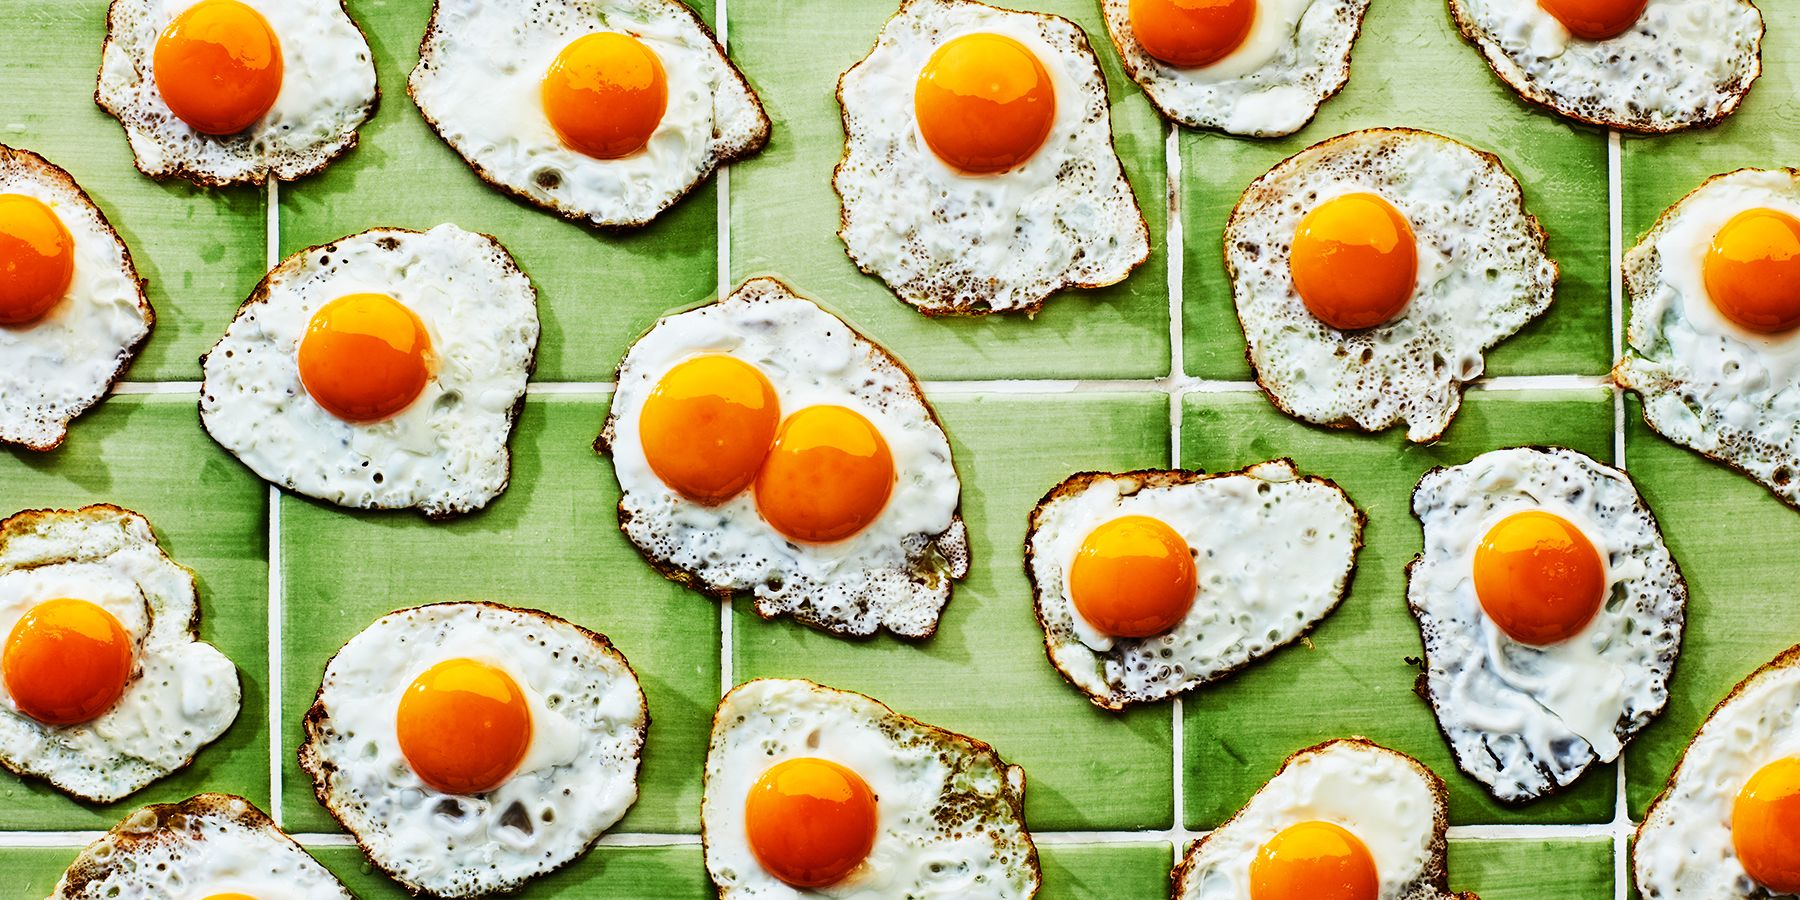 What Double Yolk Eggs Mean